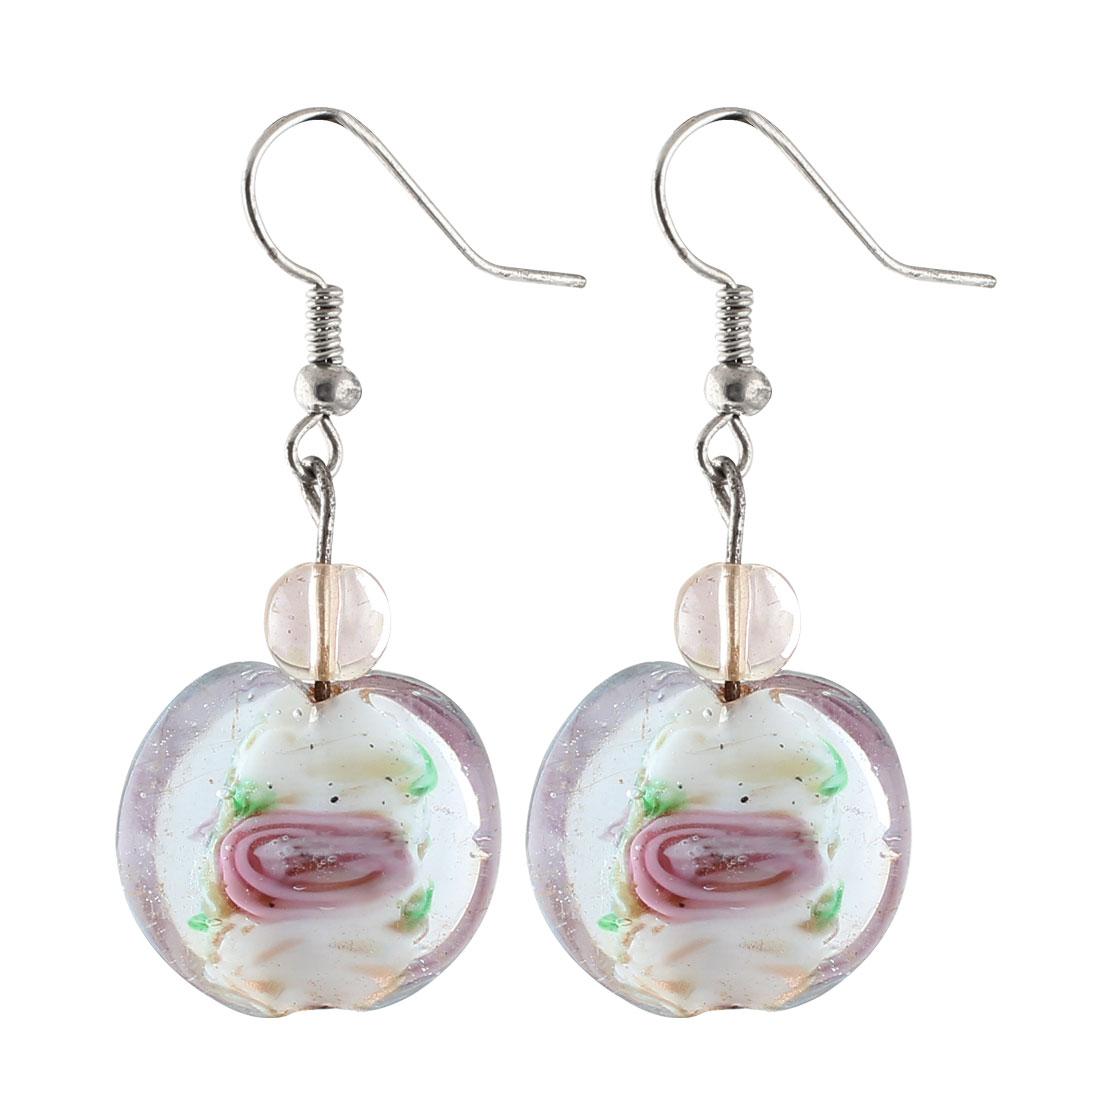 Lady Plastic Bead Inner Flower Press Pendant Fish Hook Earrings Ornaments White Pair